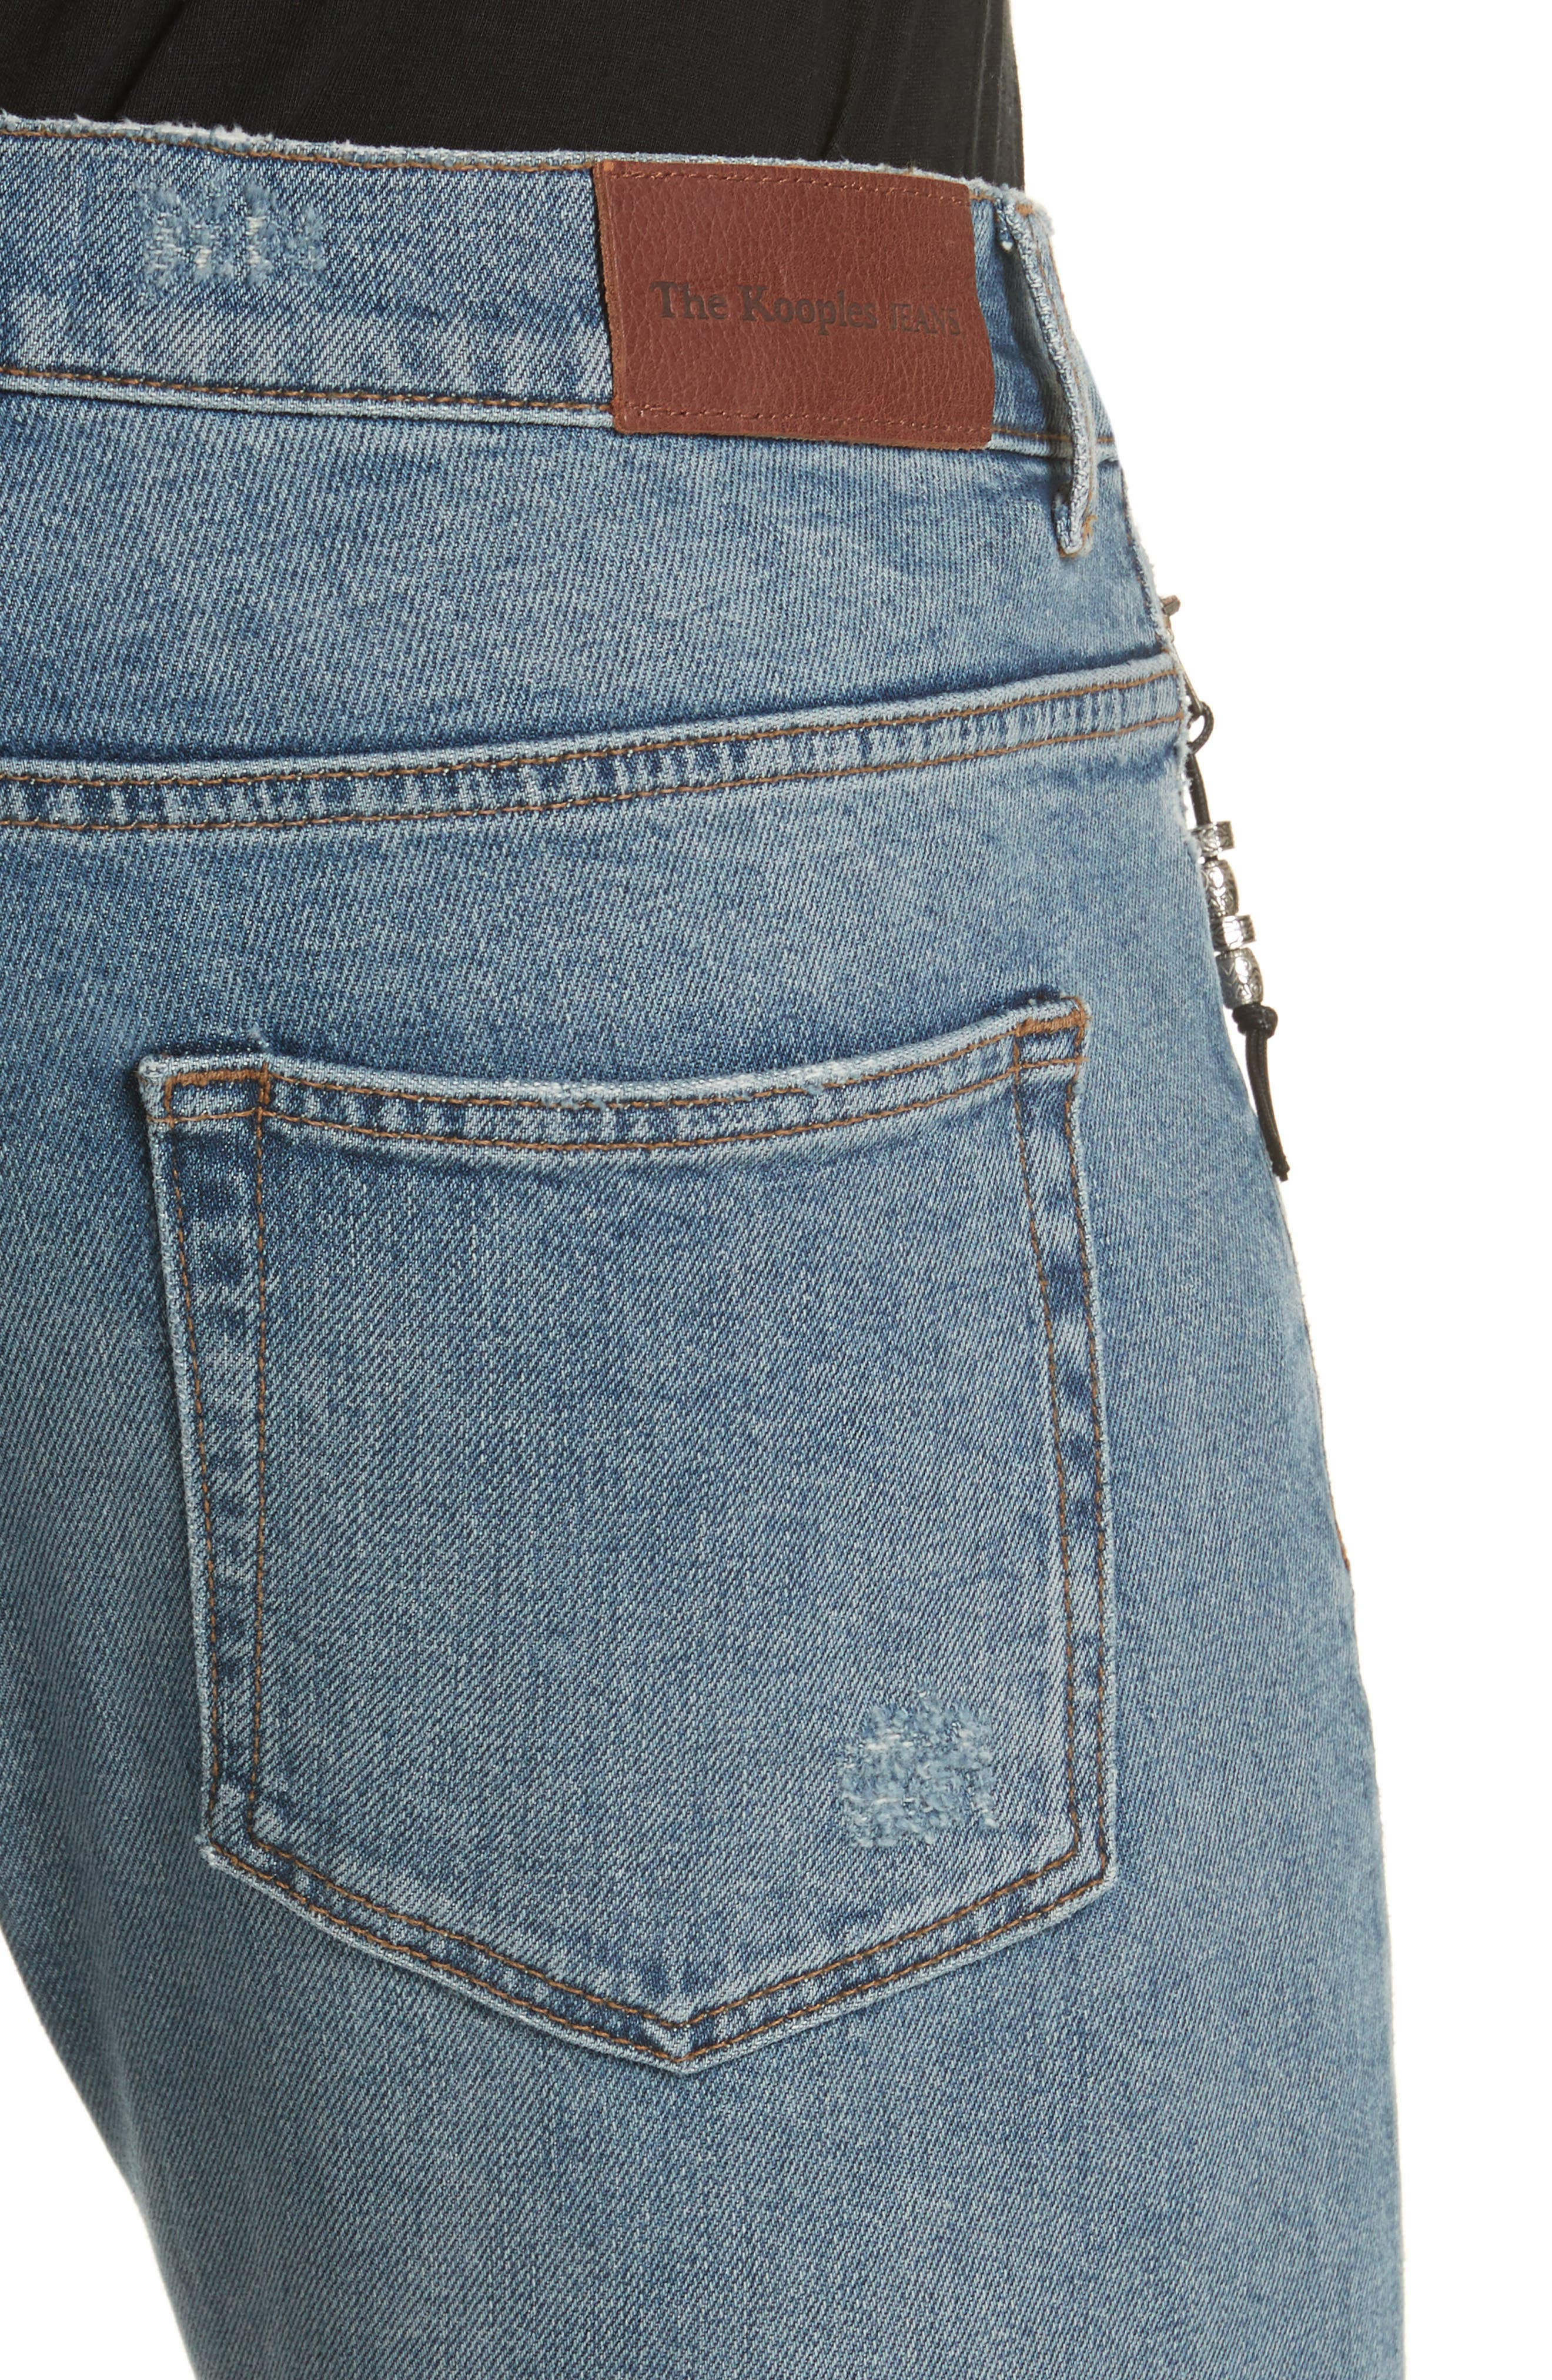 Destroyed Skinny Fit Jeans,                             Alternate thumbnail 4, color,                             Blu 88